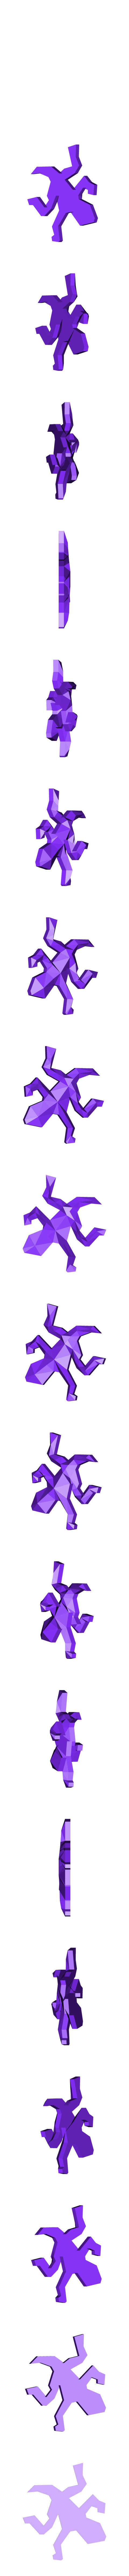 Escher_Lizard_LowPoly_Small_ok.stl Download free STL file Escher Lizards • 3D printable model, Chrisibub